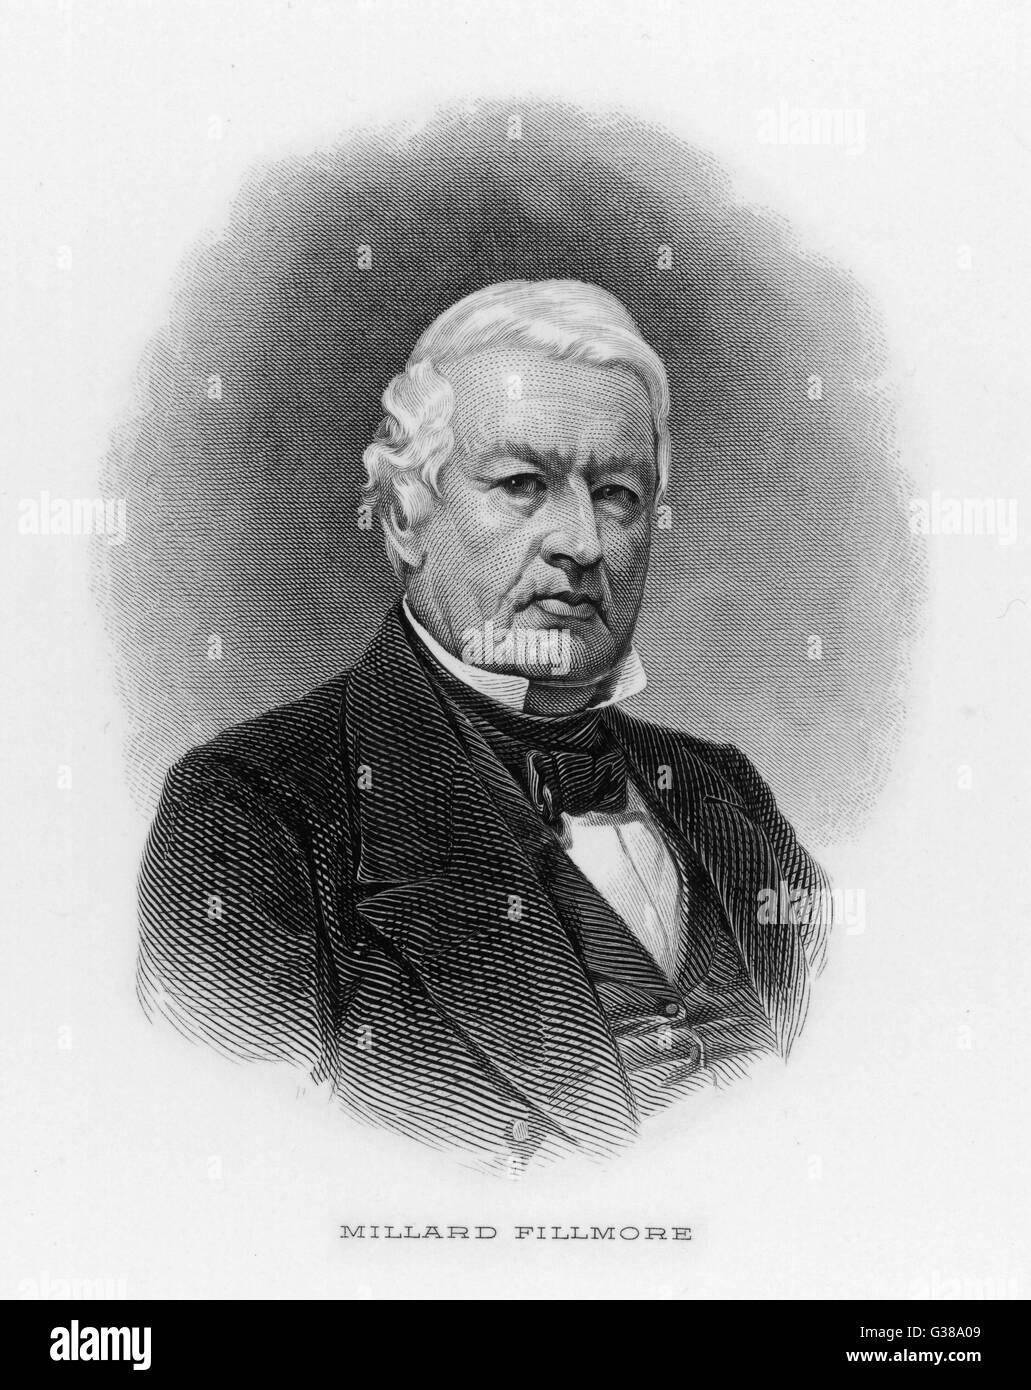 MILLARD FILLMORE  13th American President (1850-53).       Date: 1800 - 1874 Stock Photo